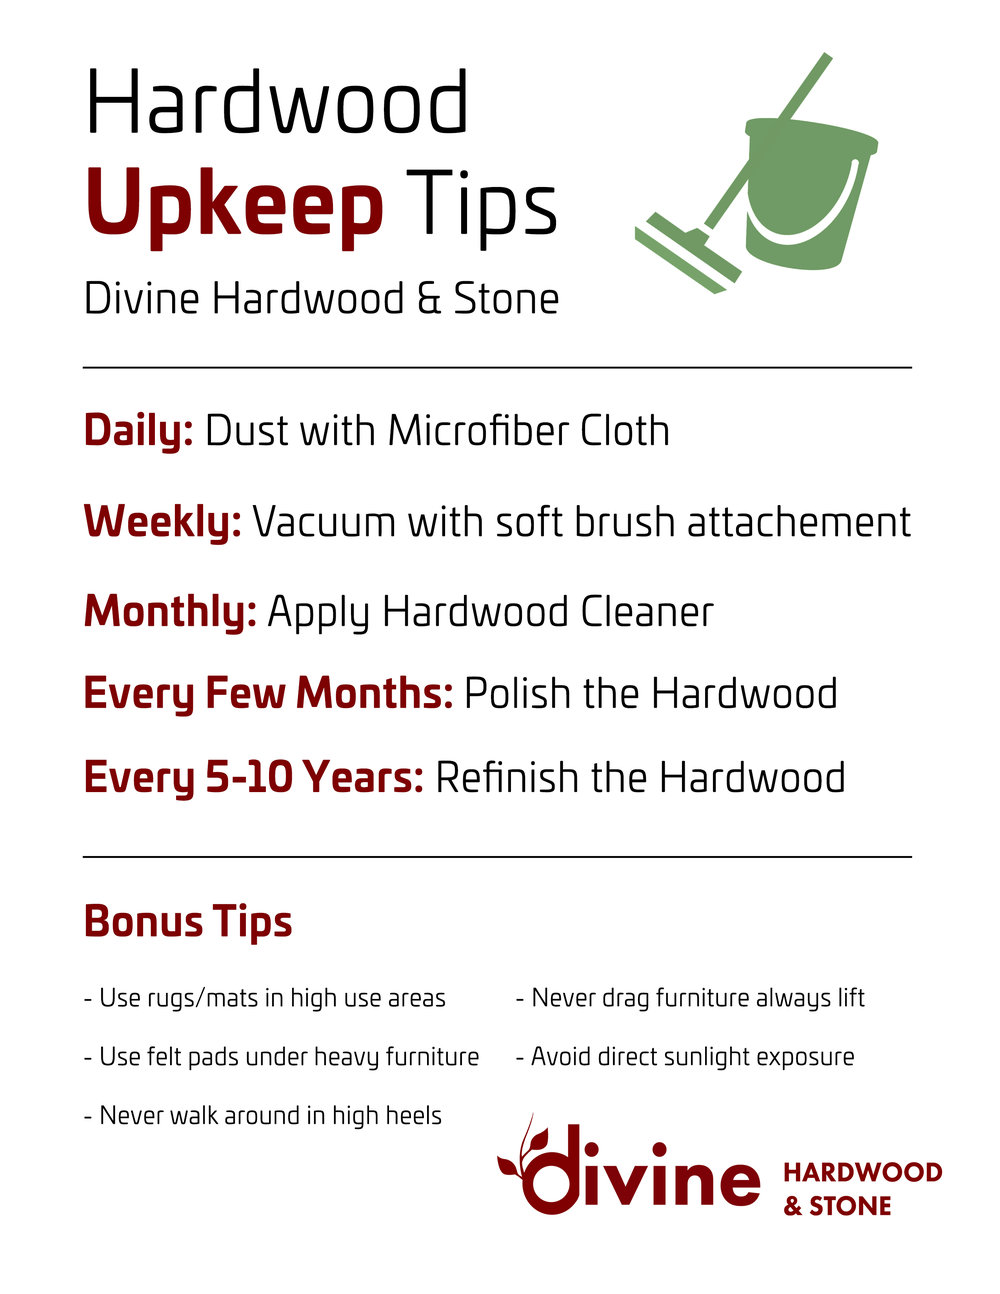 Hardwood Upkeep Checklist by Divine Hardwood & Stone in Portland, OR